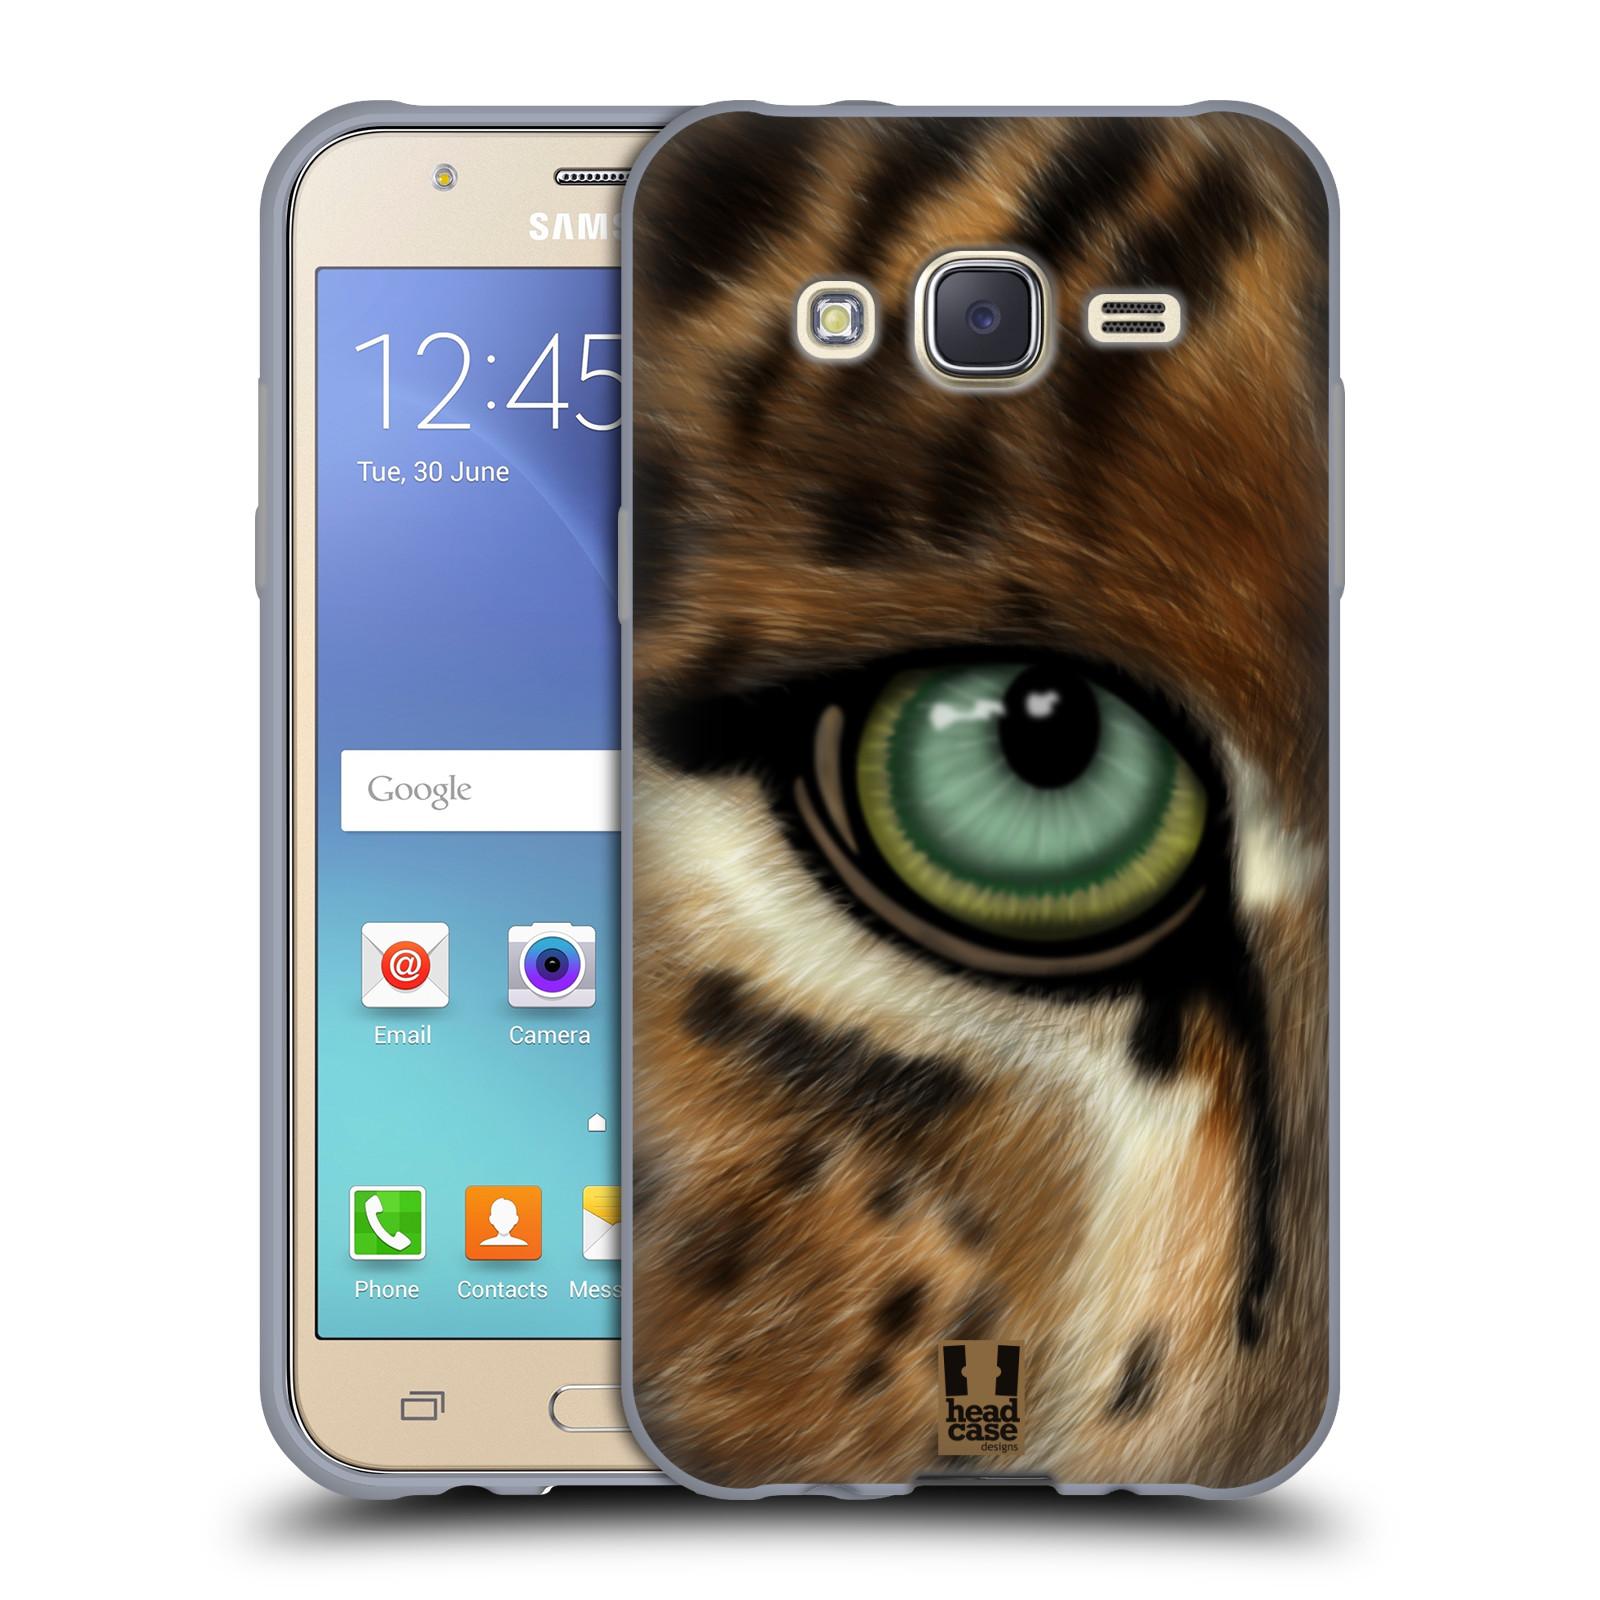 HEAD CASE silikonový obal na mobil Samsung Galaxy J5, J500, (J5 DUOS) vzor pohled zvířete oko leopard